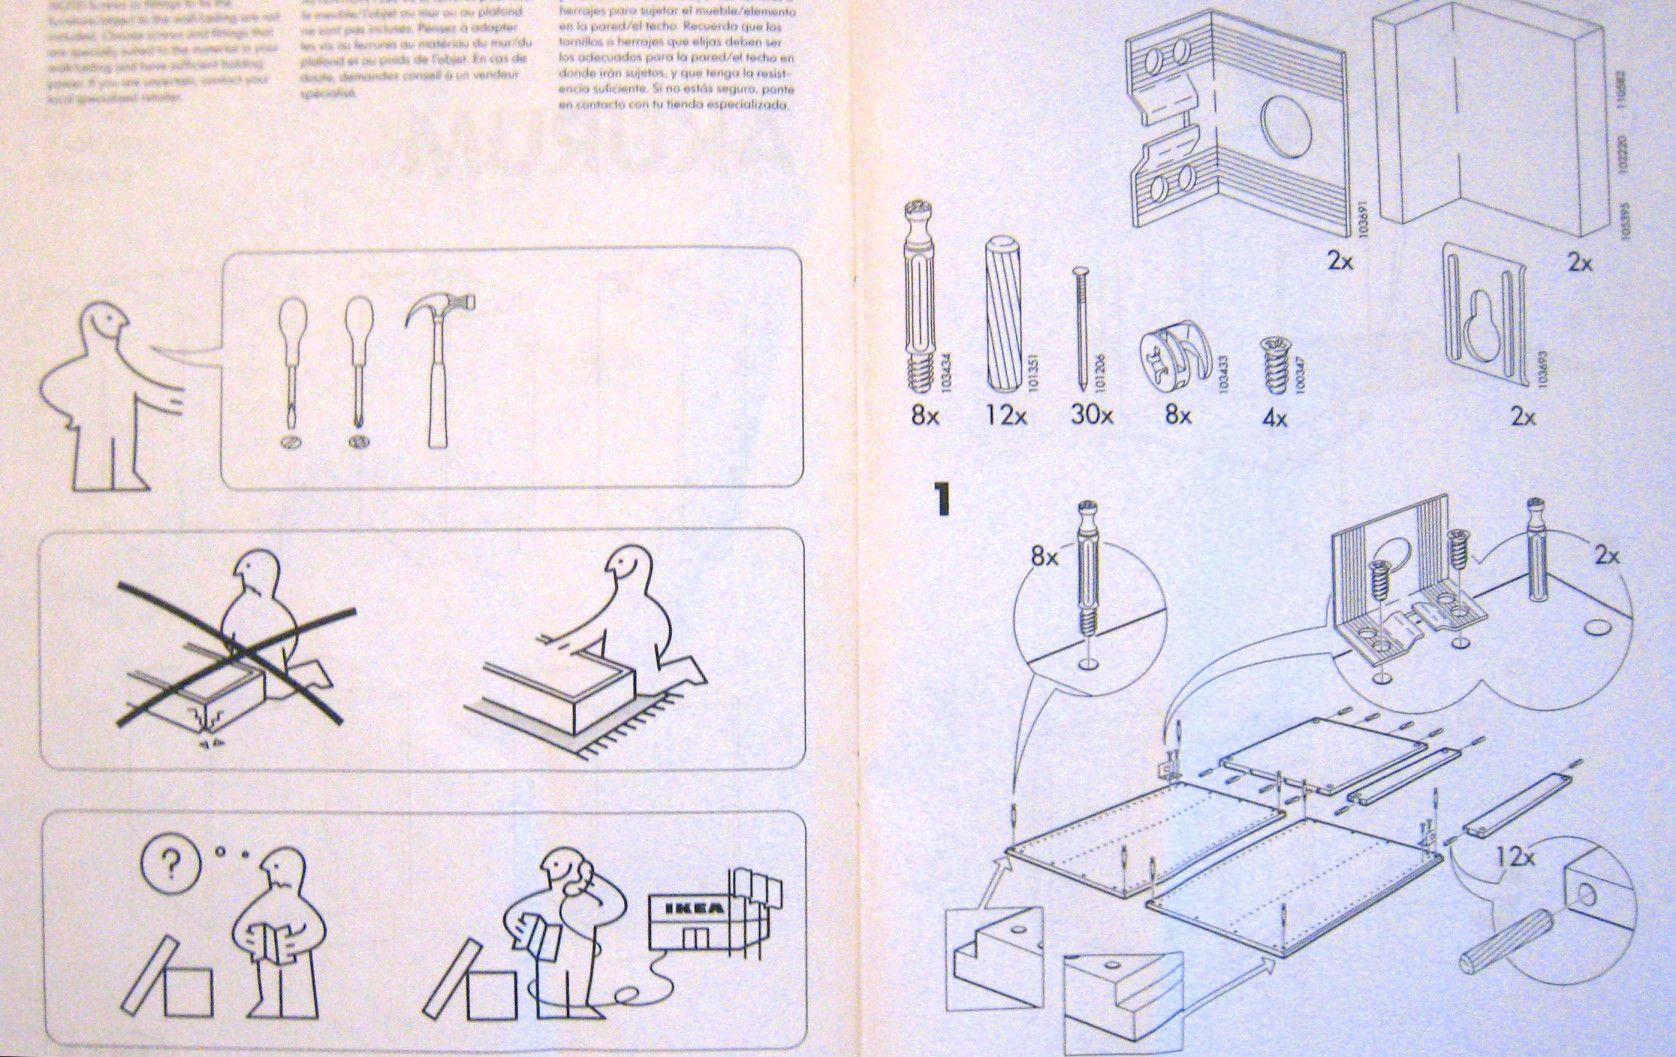 2019 Ikea Kitchen Cabinet Installation Guide Corner Kitchen Cupboard Ideas Check More At Http Www Pl Ikea Kitchen Cabinets Ikea Kitchen Installing Cabinets